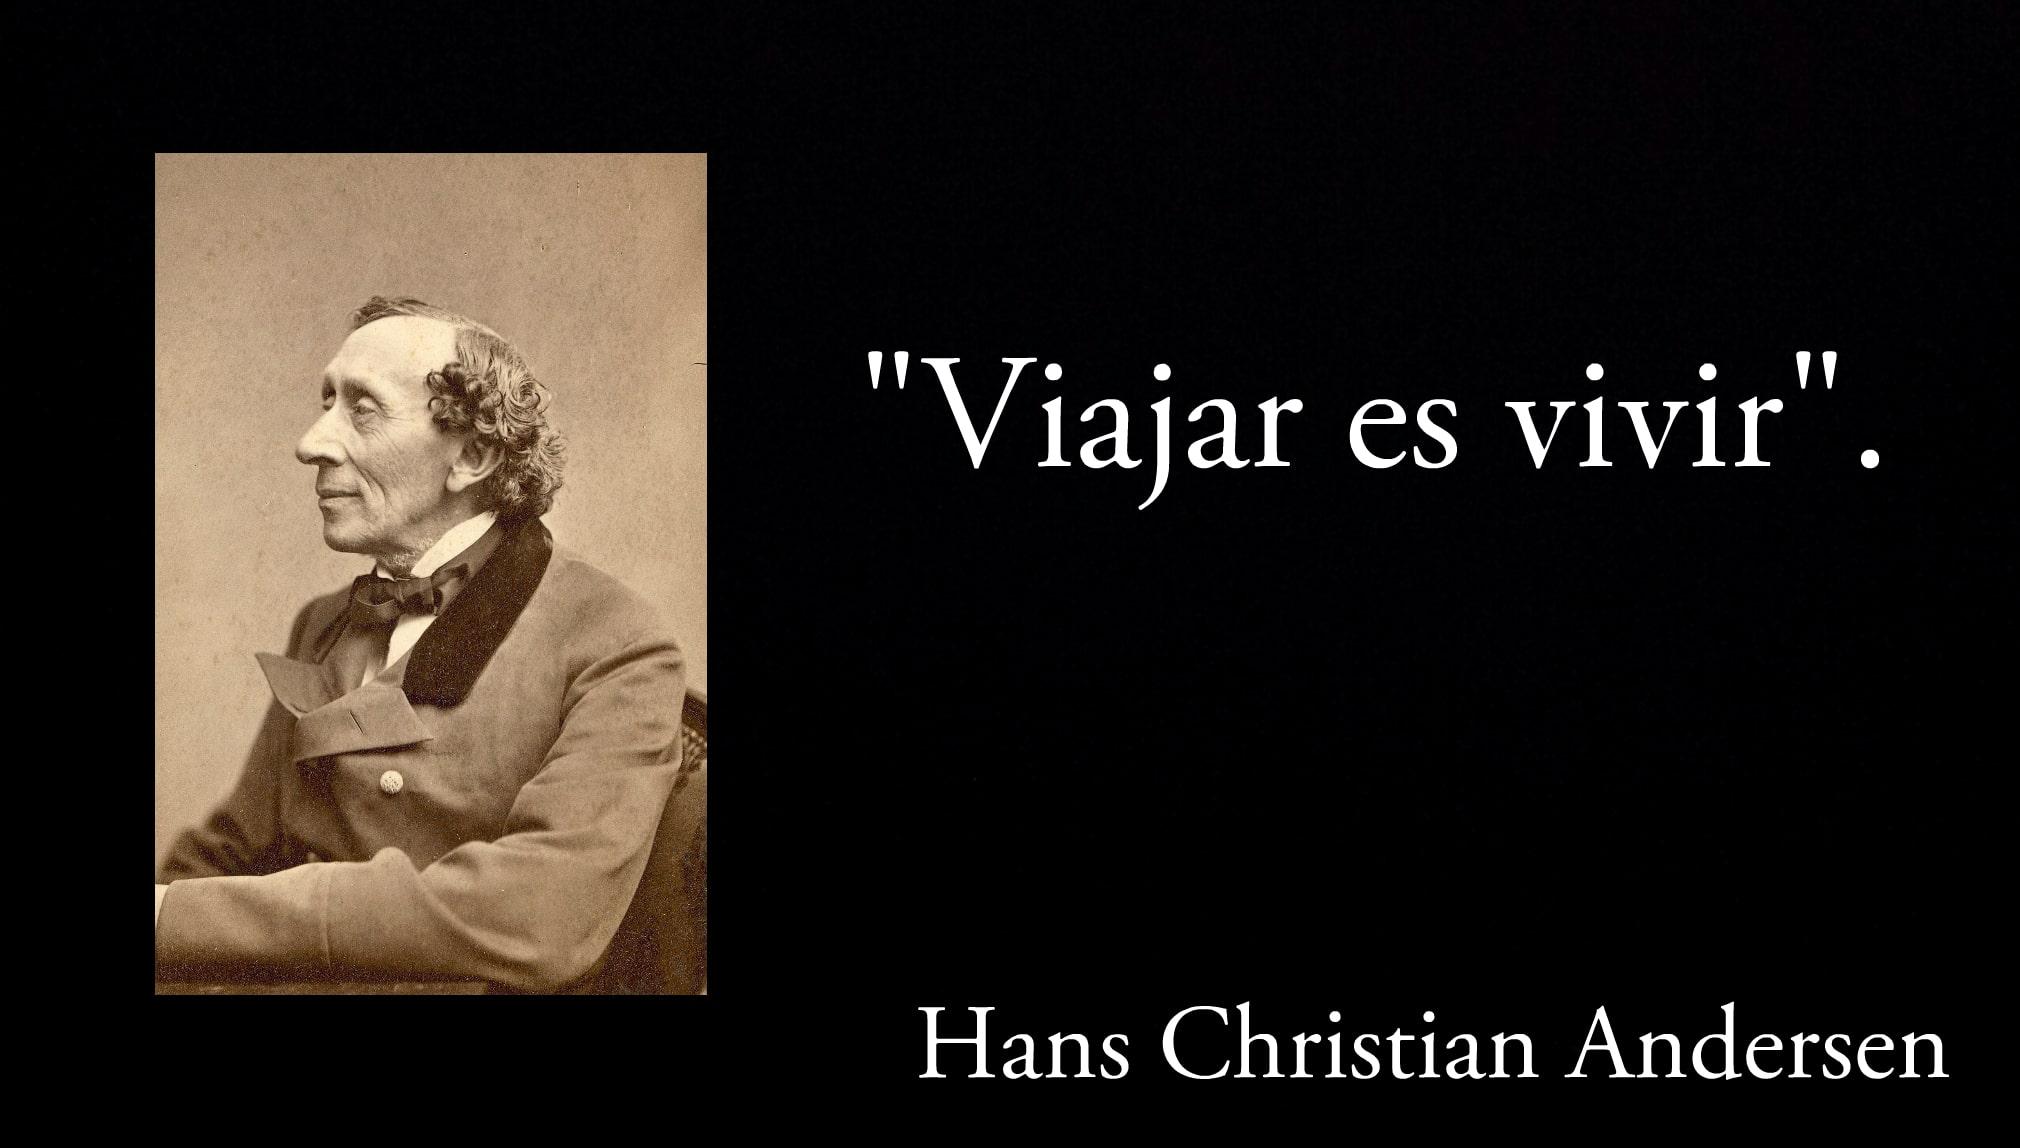 Frase de Hans Chistian Andersen.